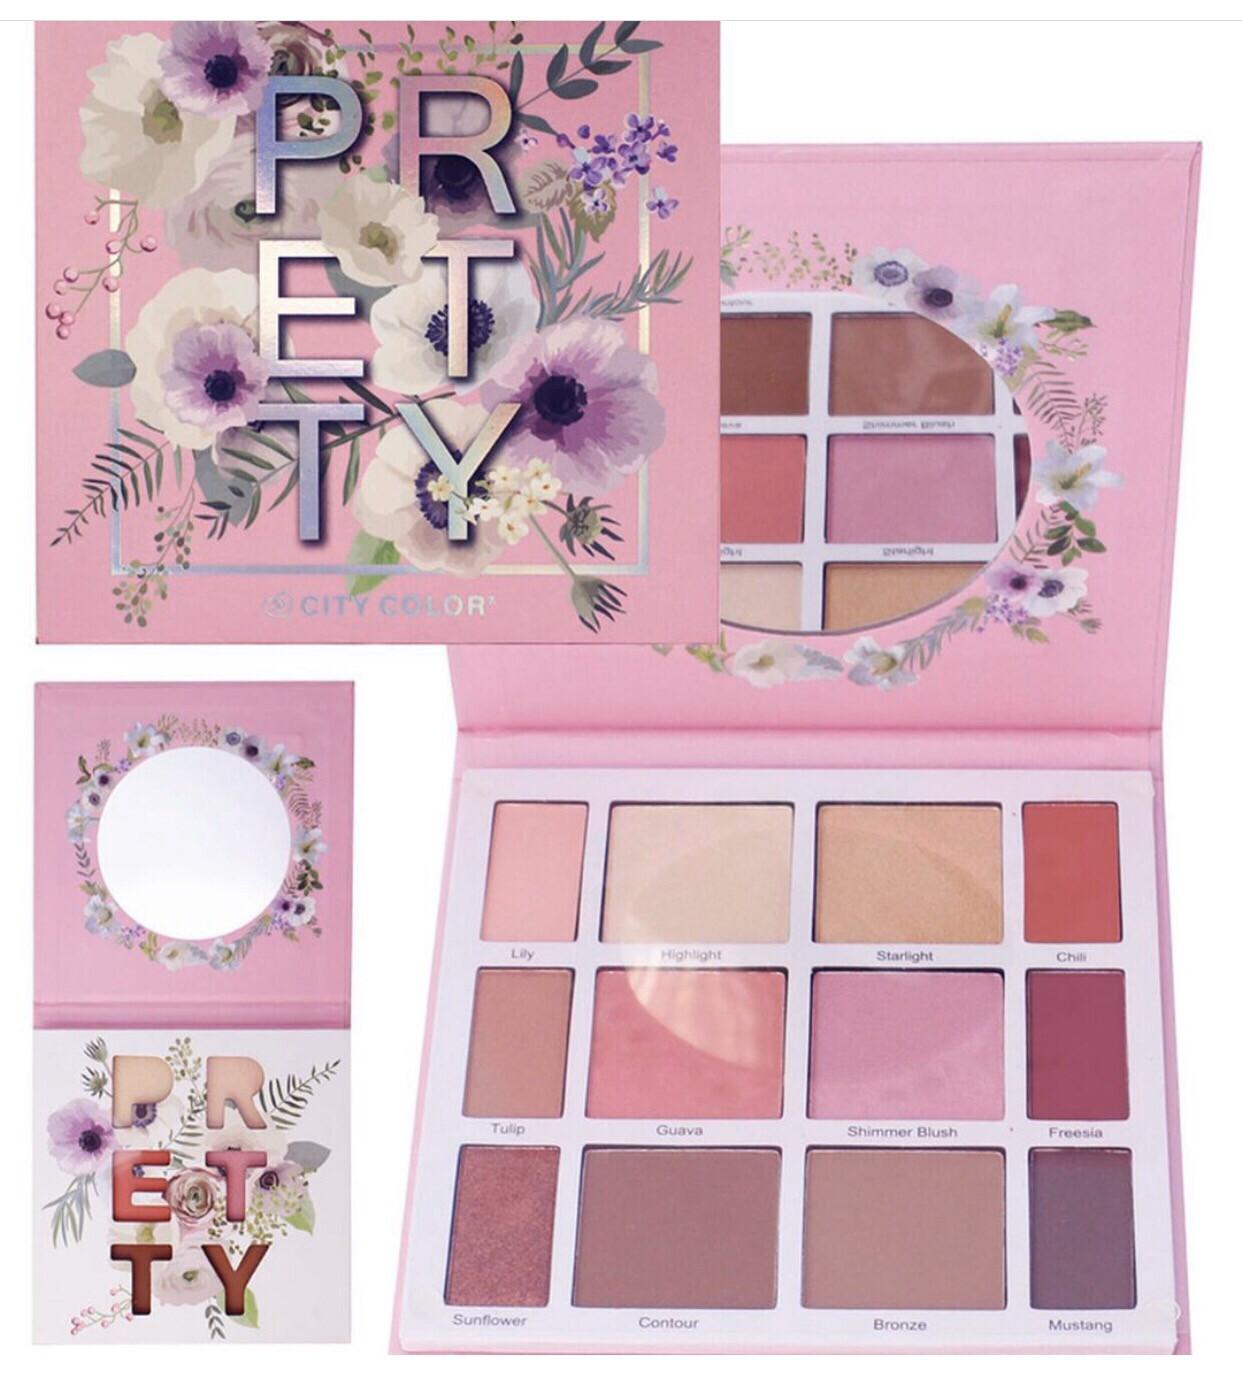 Pretty Palette (highlight, Contour, Blush)